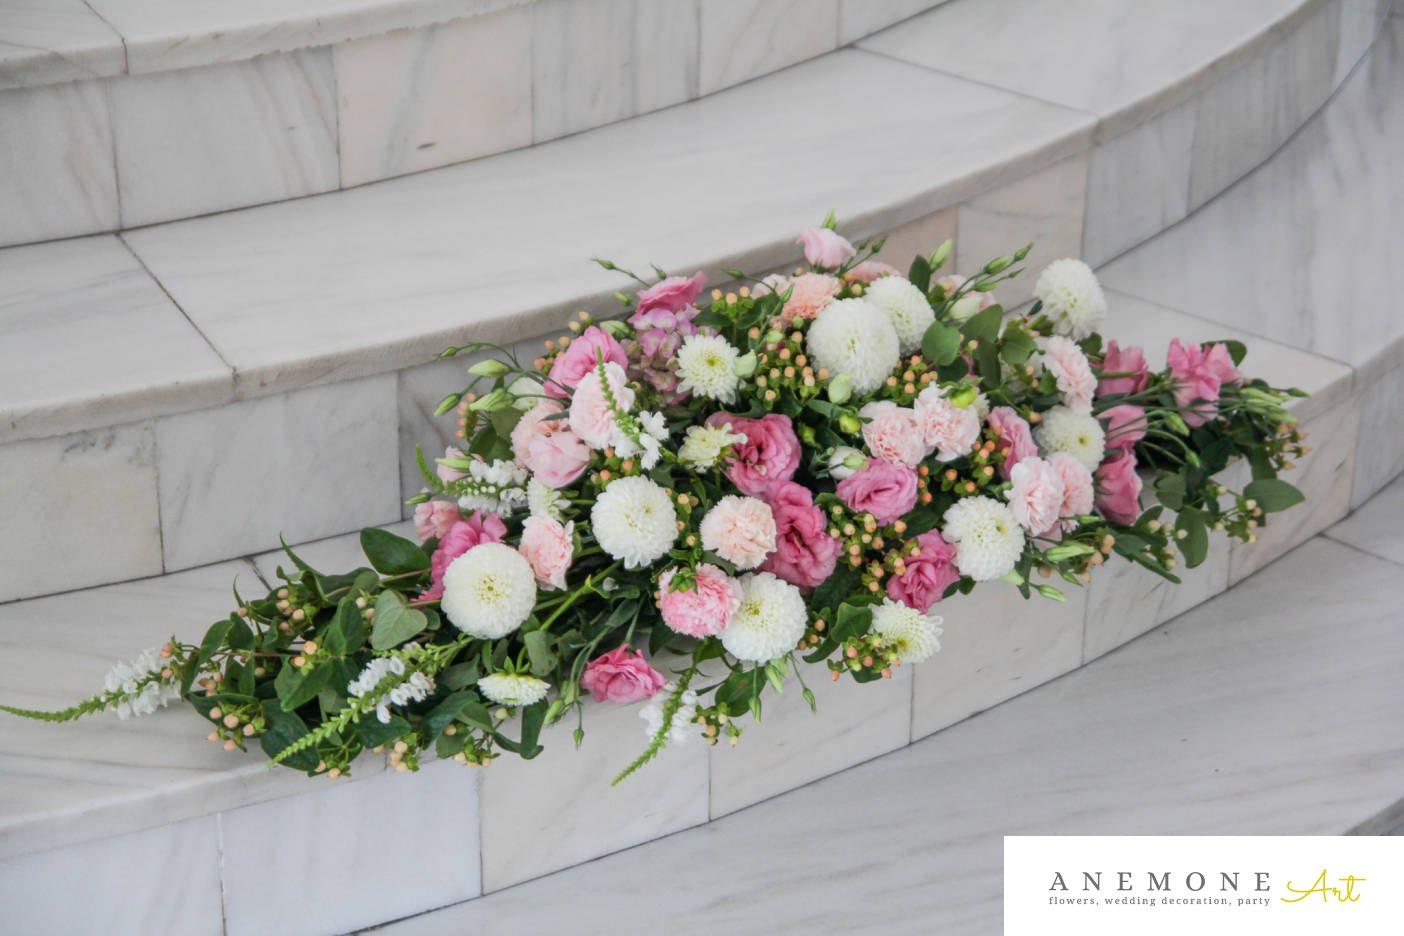 Poza, foto cu Flori de nunta alb, dalia, decor masa, garoafe, lisianthus, roz in Arad, Timisoara, Oradea (wedding flowers, bouquets) nunta Arad, Timisoara, Oradea